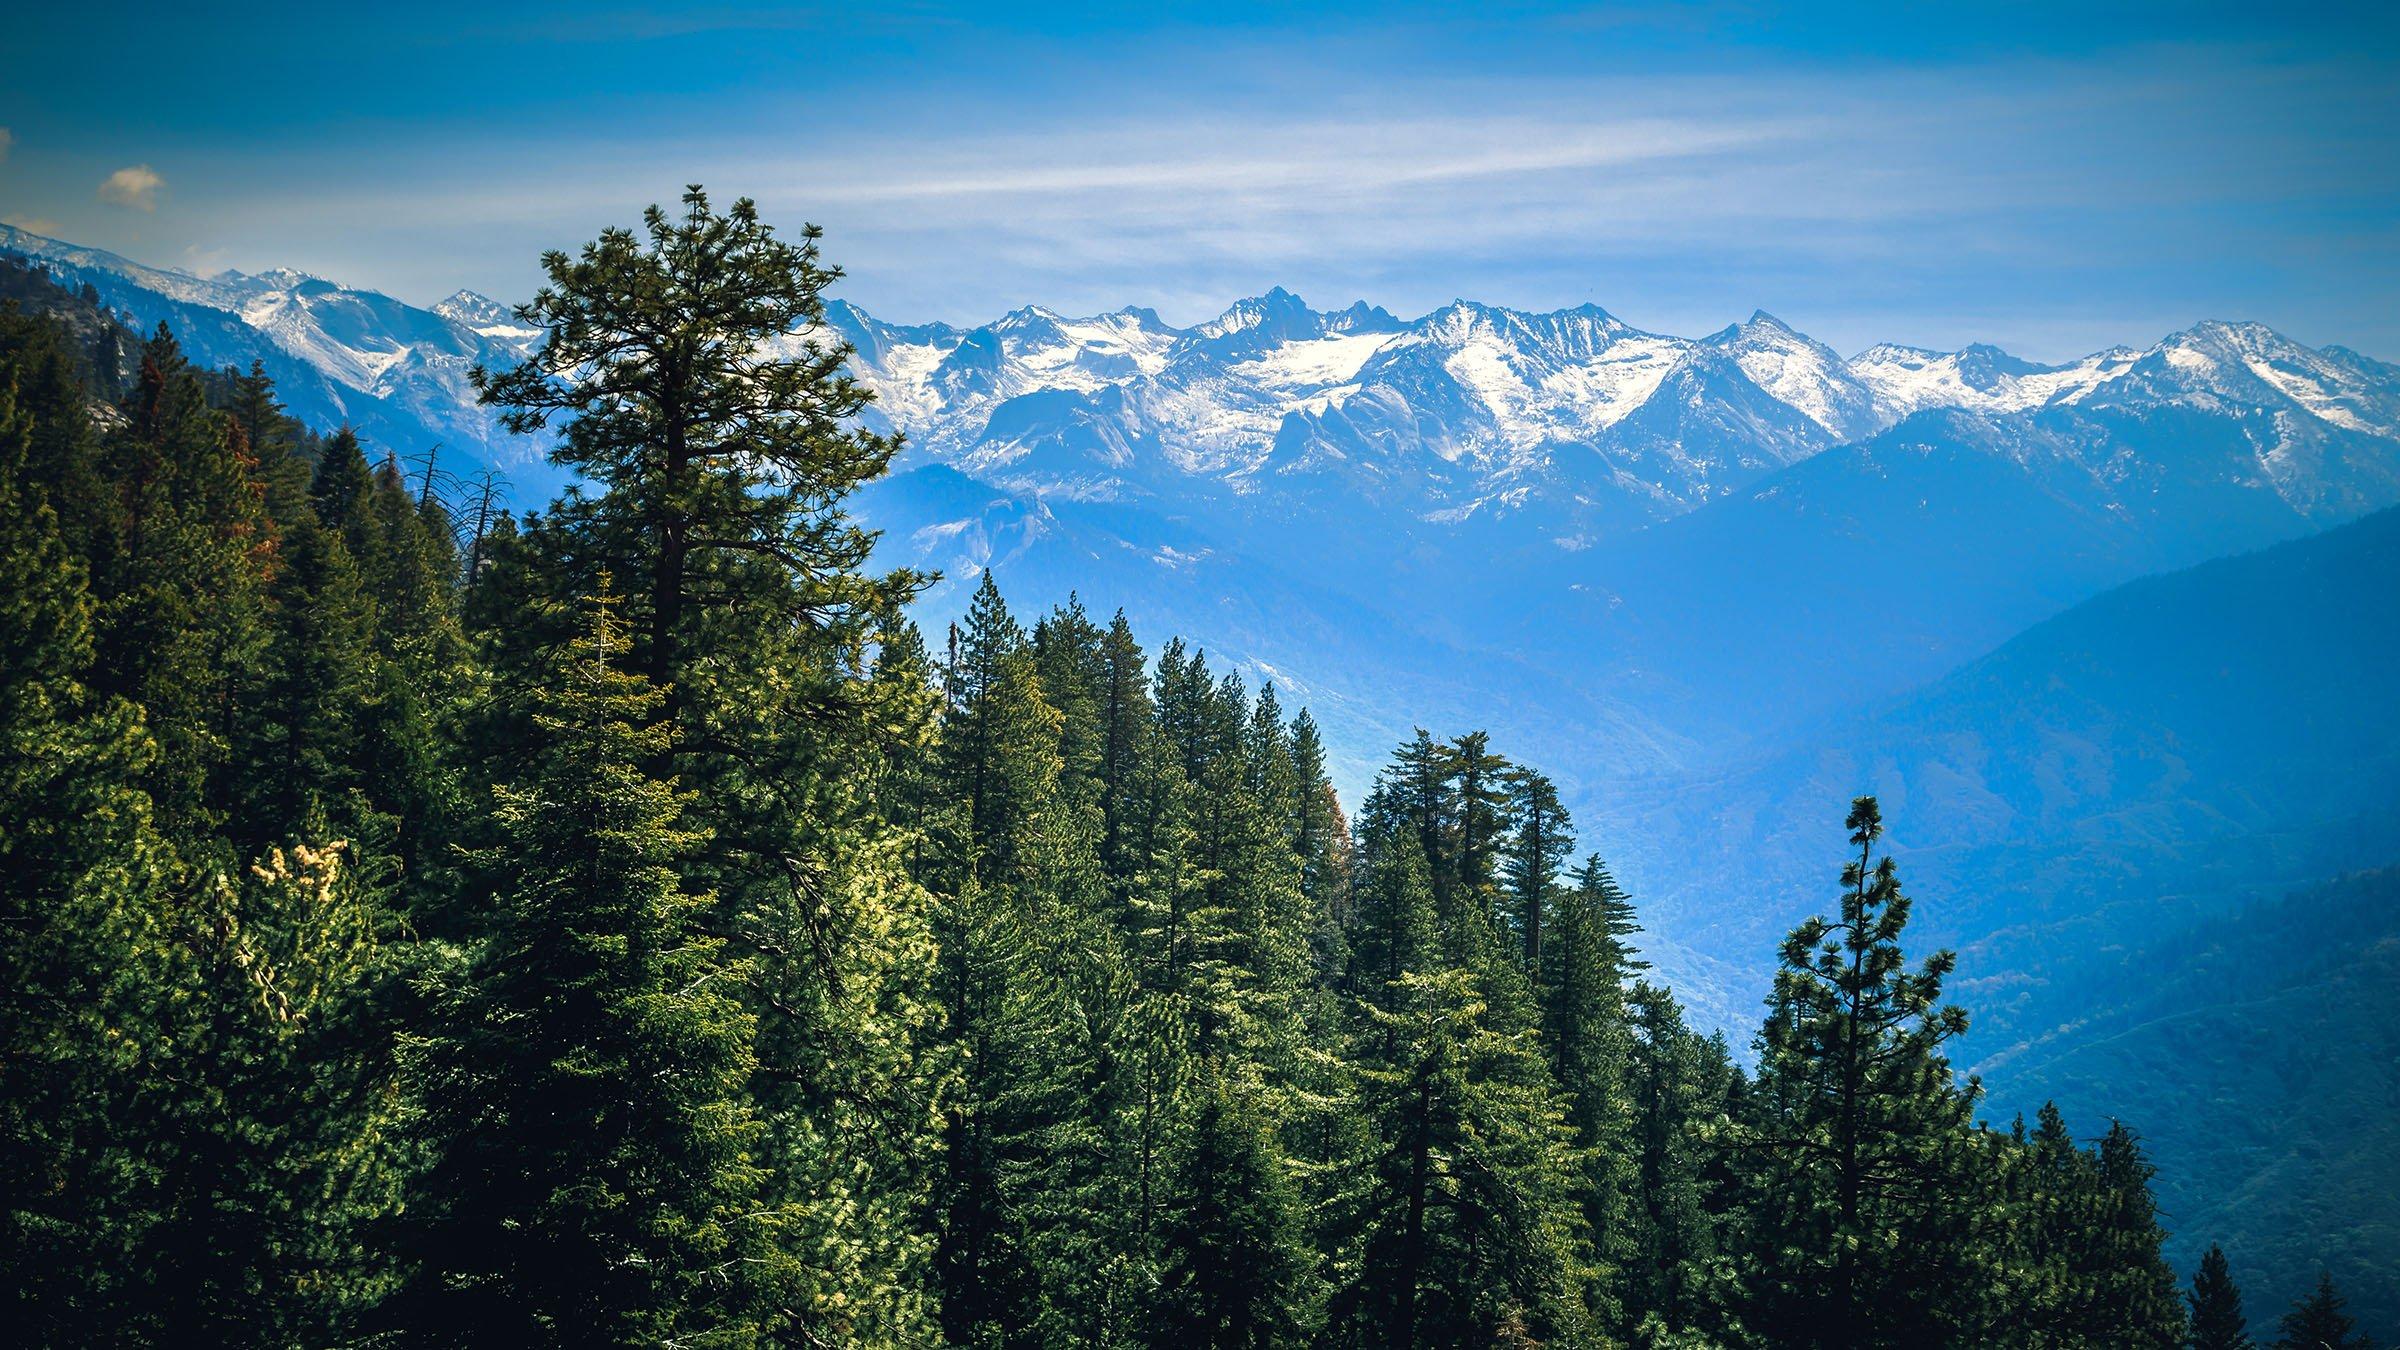 Bioclimático Bosques en California, Estados Unidos.